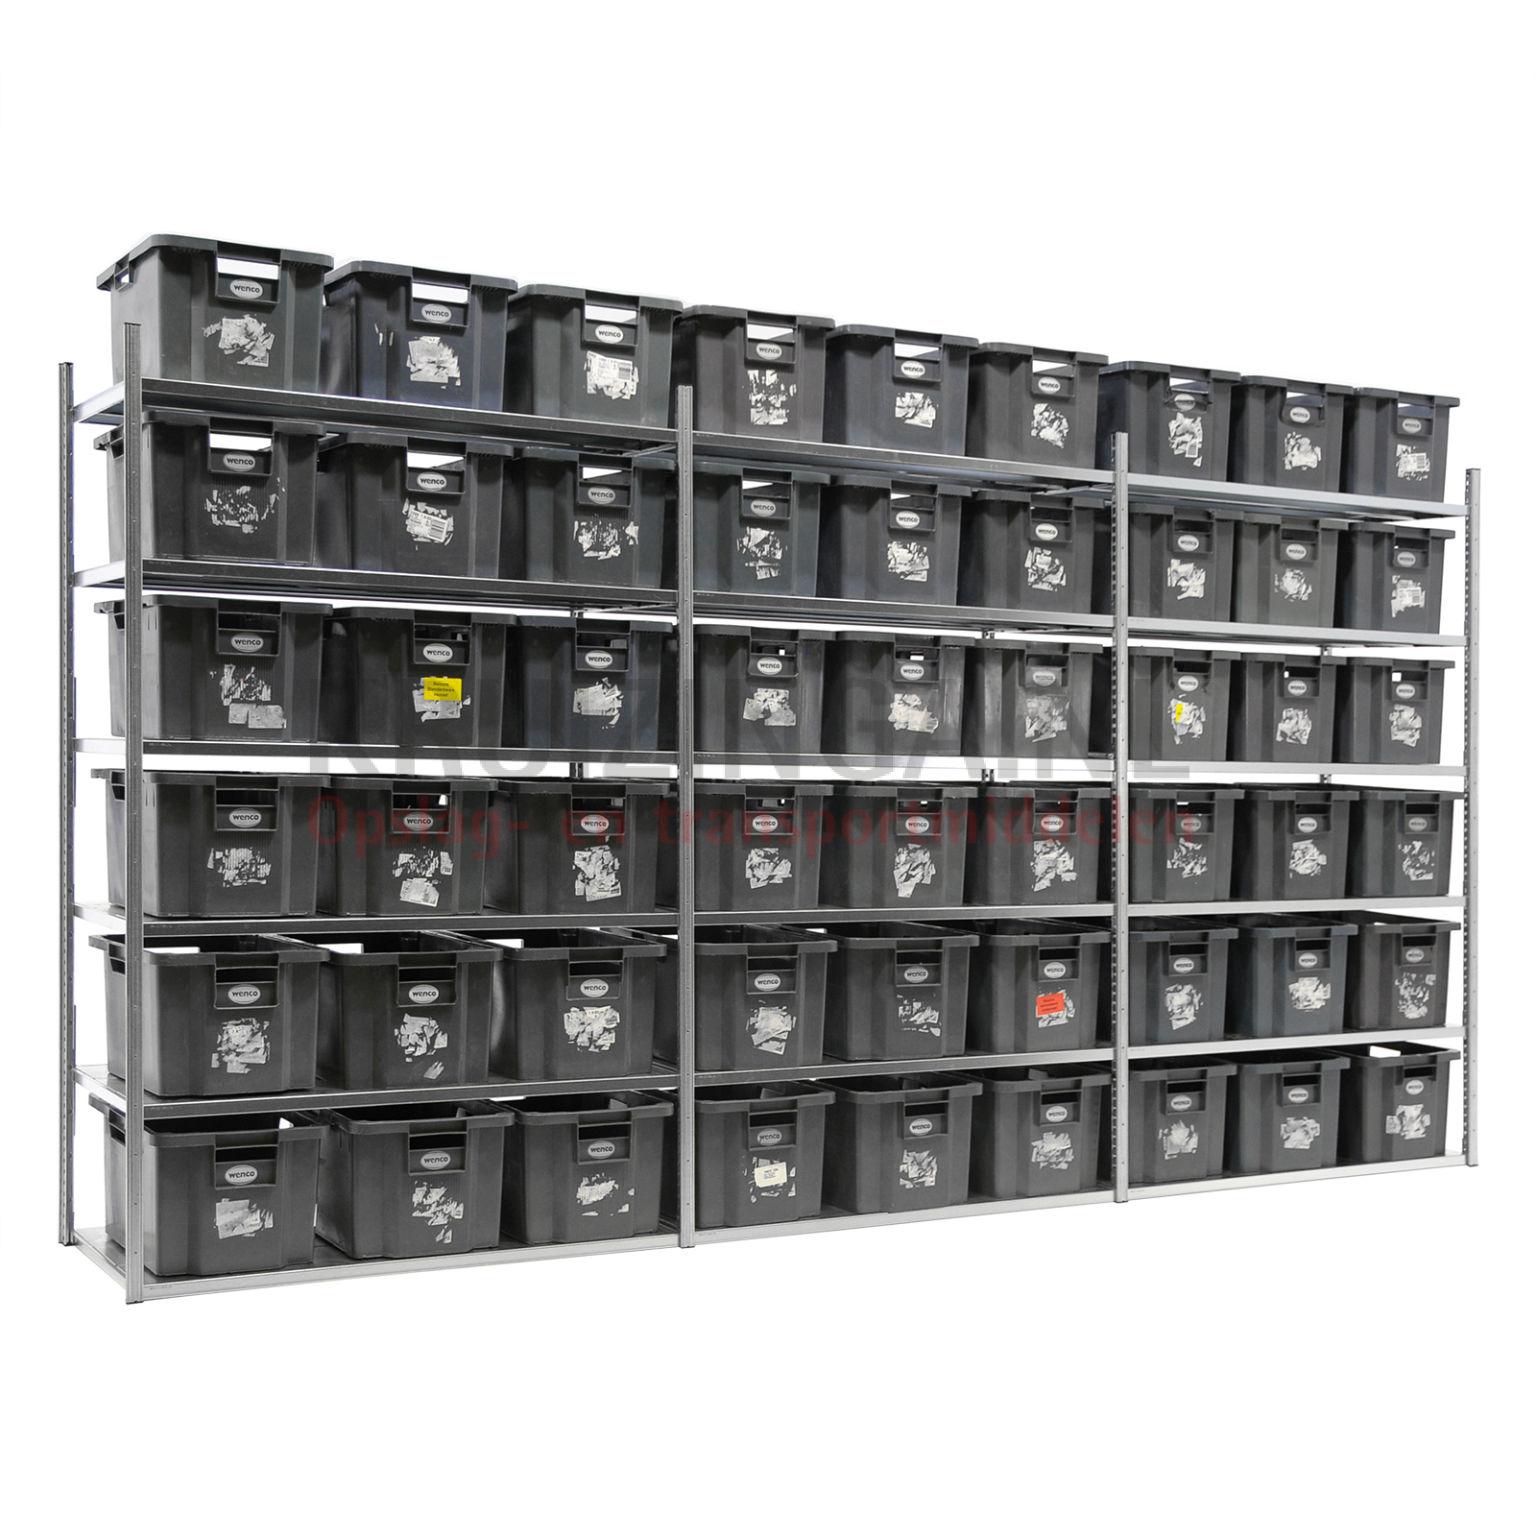 kombination satz regale kombination satz fachbodenregal inkl 54 stapelboxen gebraucht. Black Bedroom Furniture Sets. Home Design Ideas